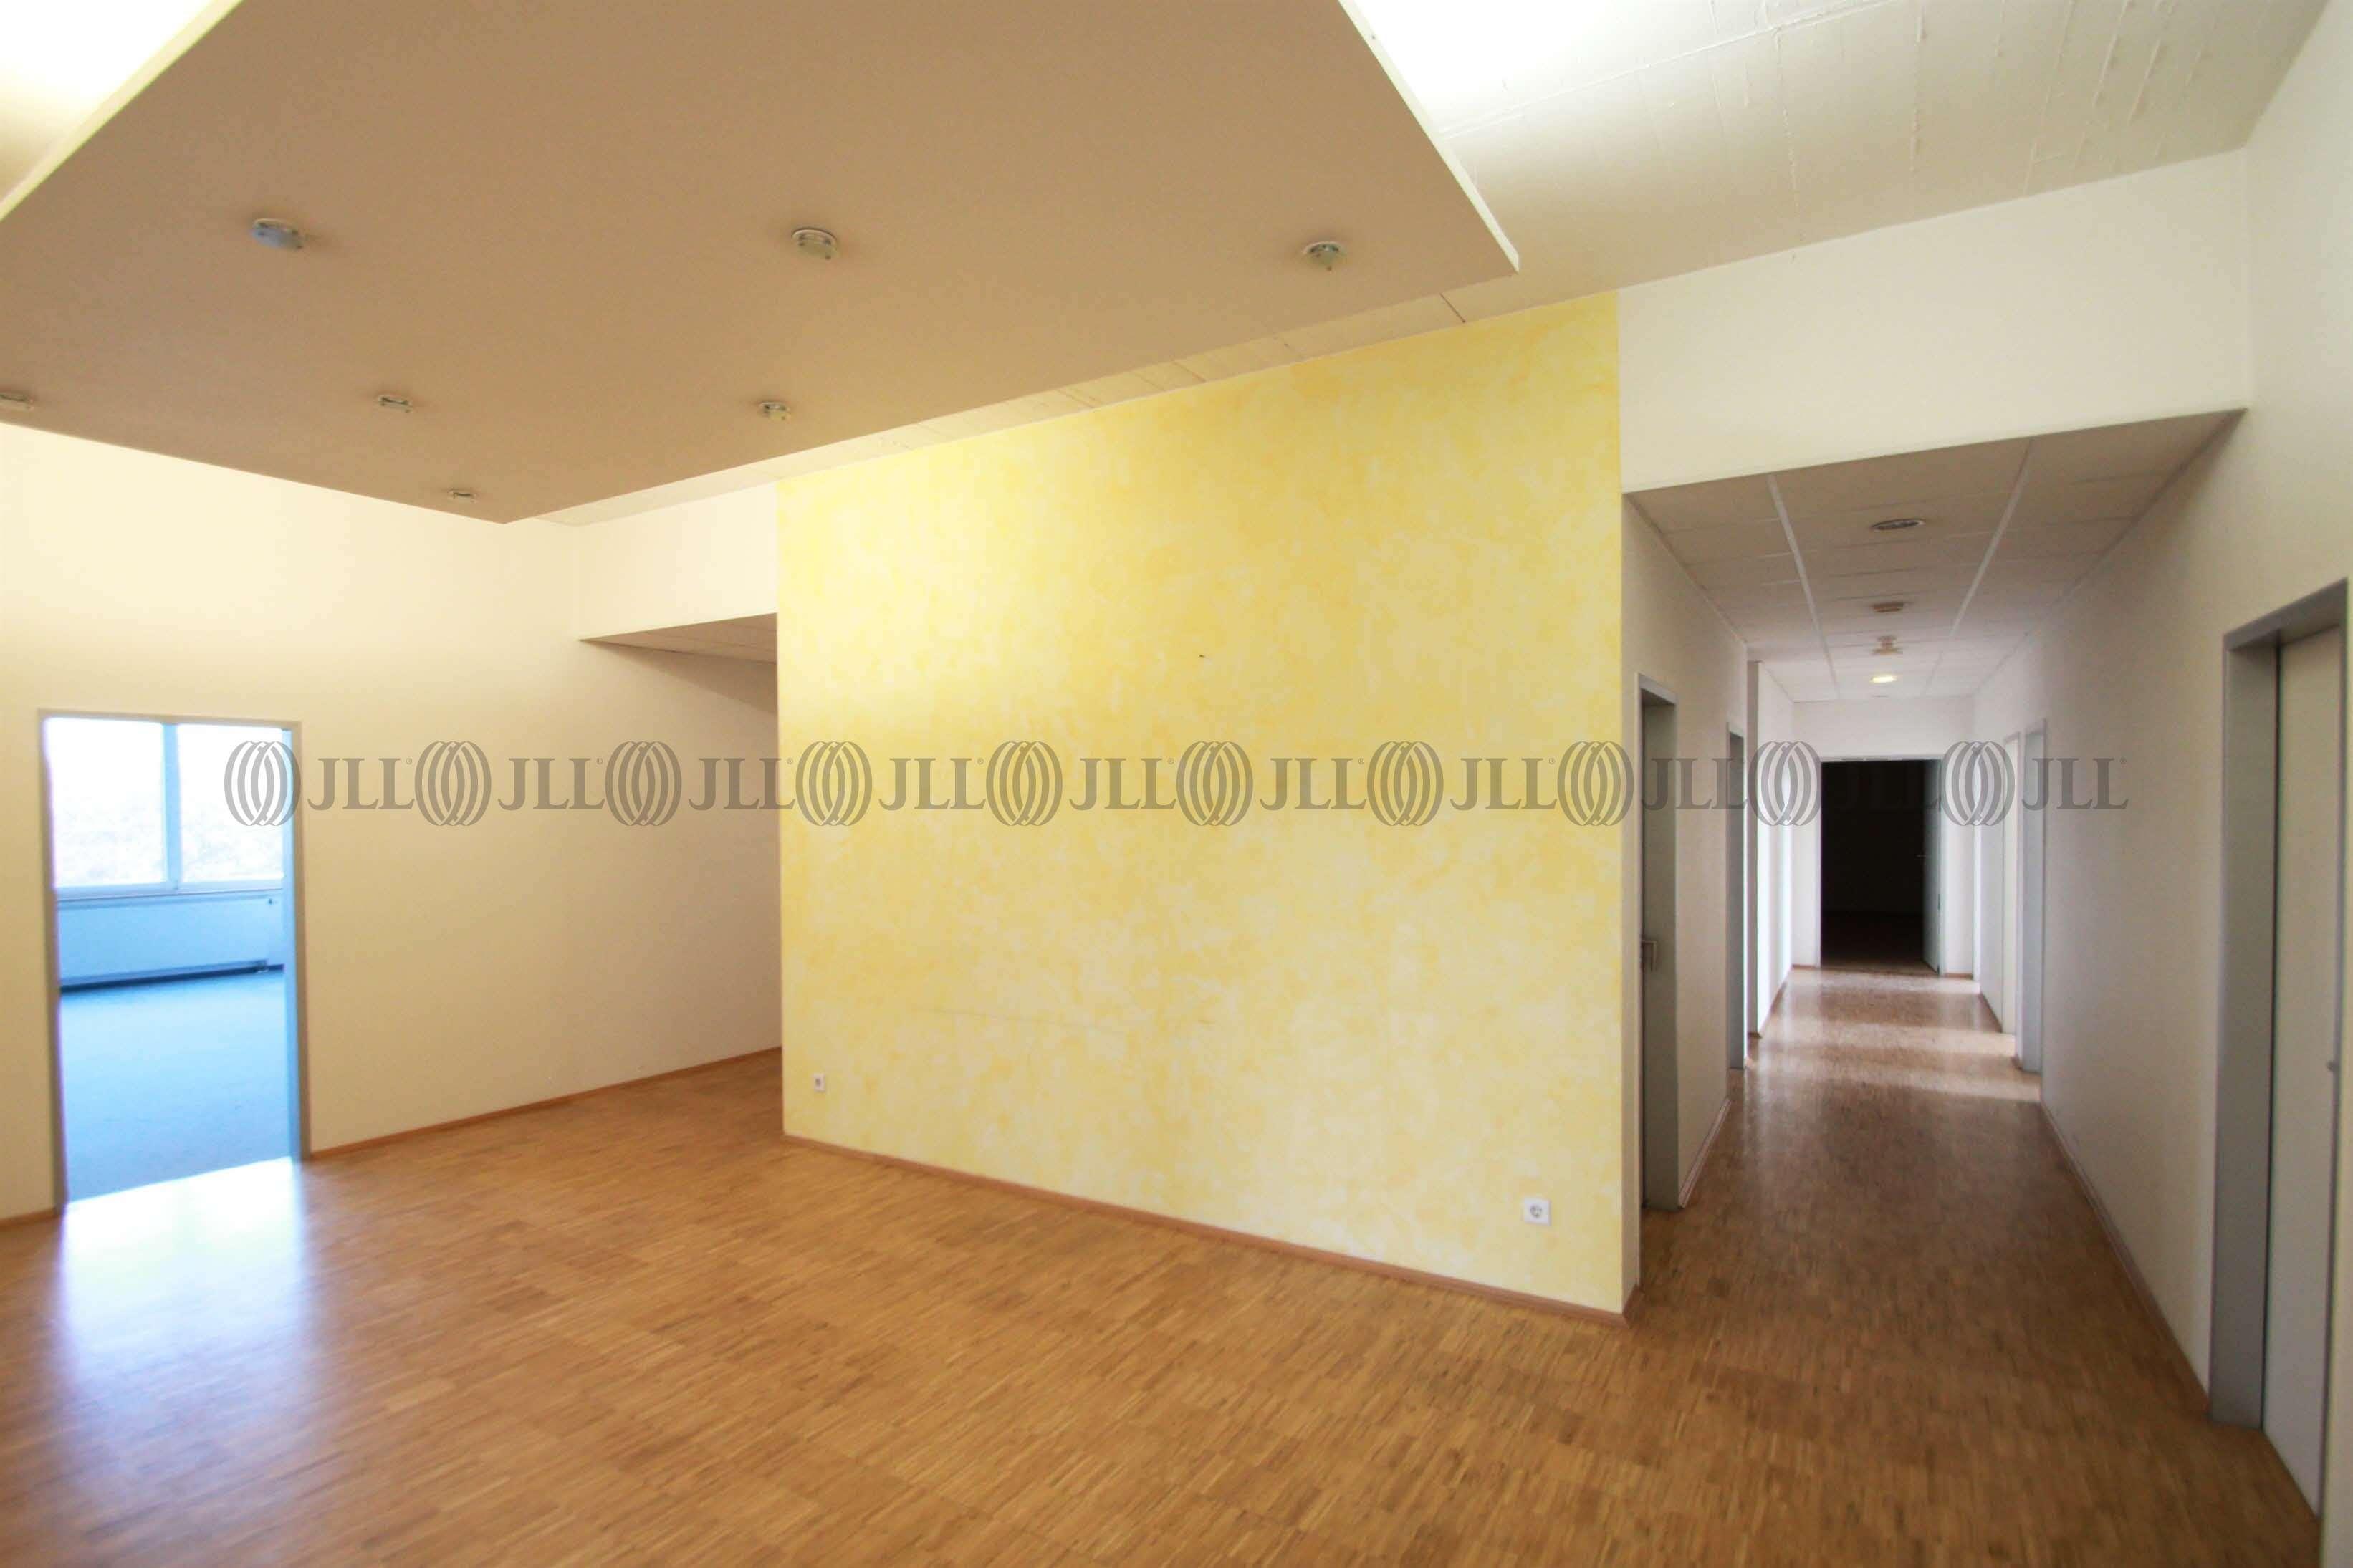 Büros Hanau, 63456 - Büro - Hanau, Klein-Auheim - F2094 - 9539463